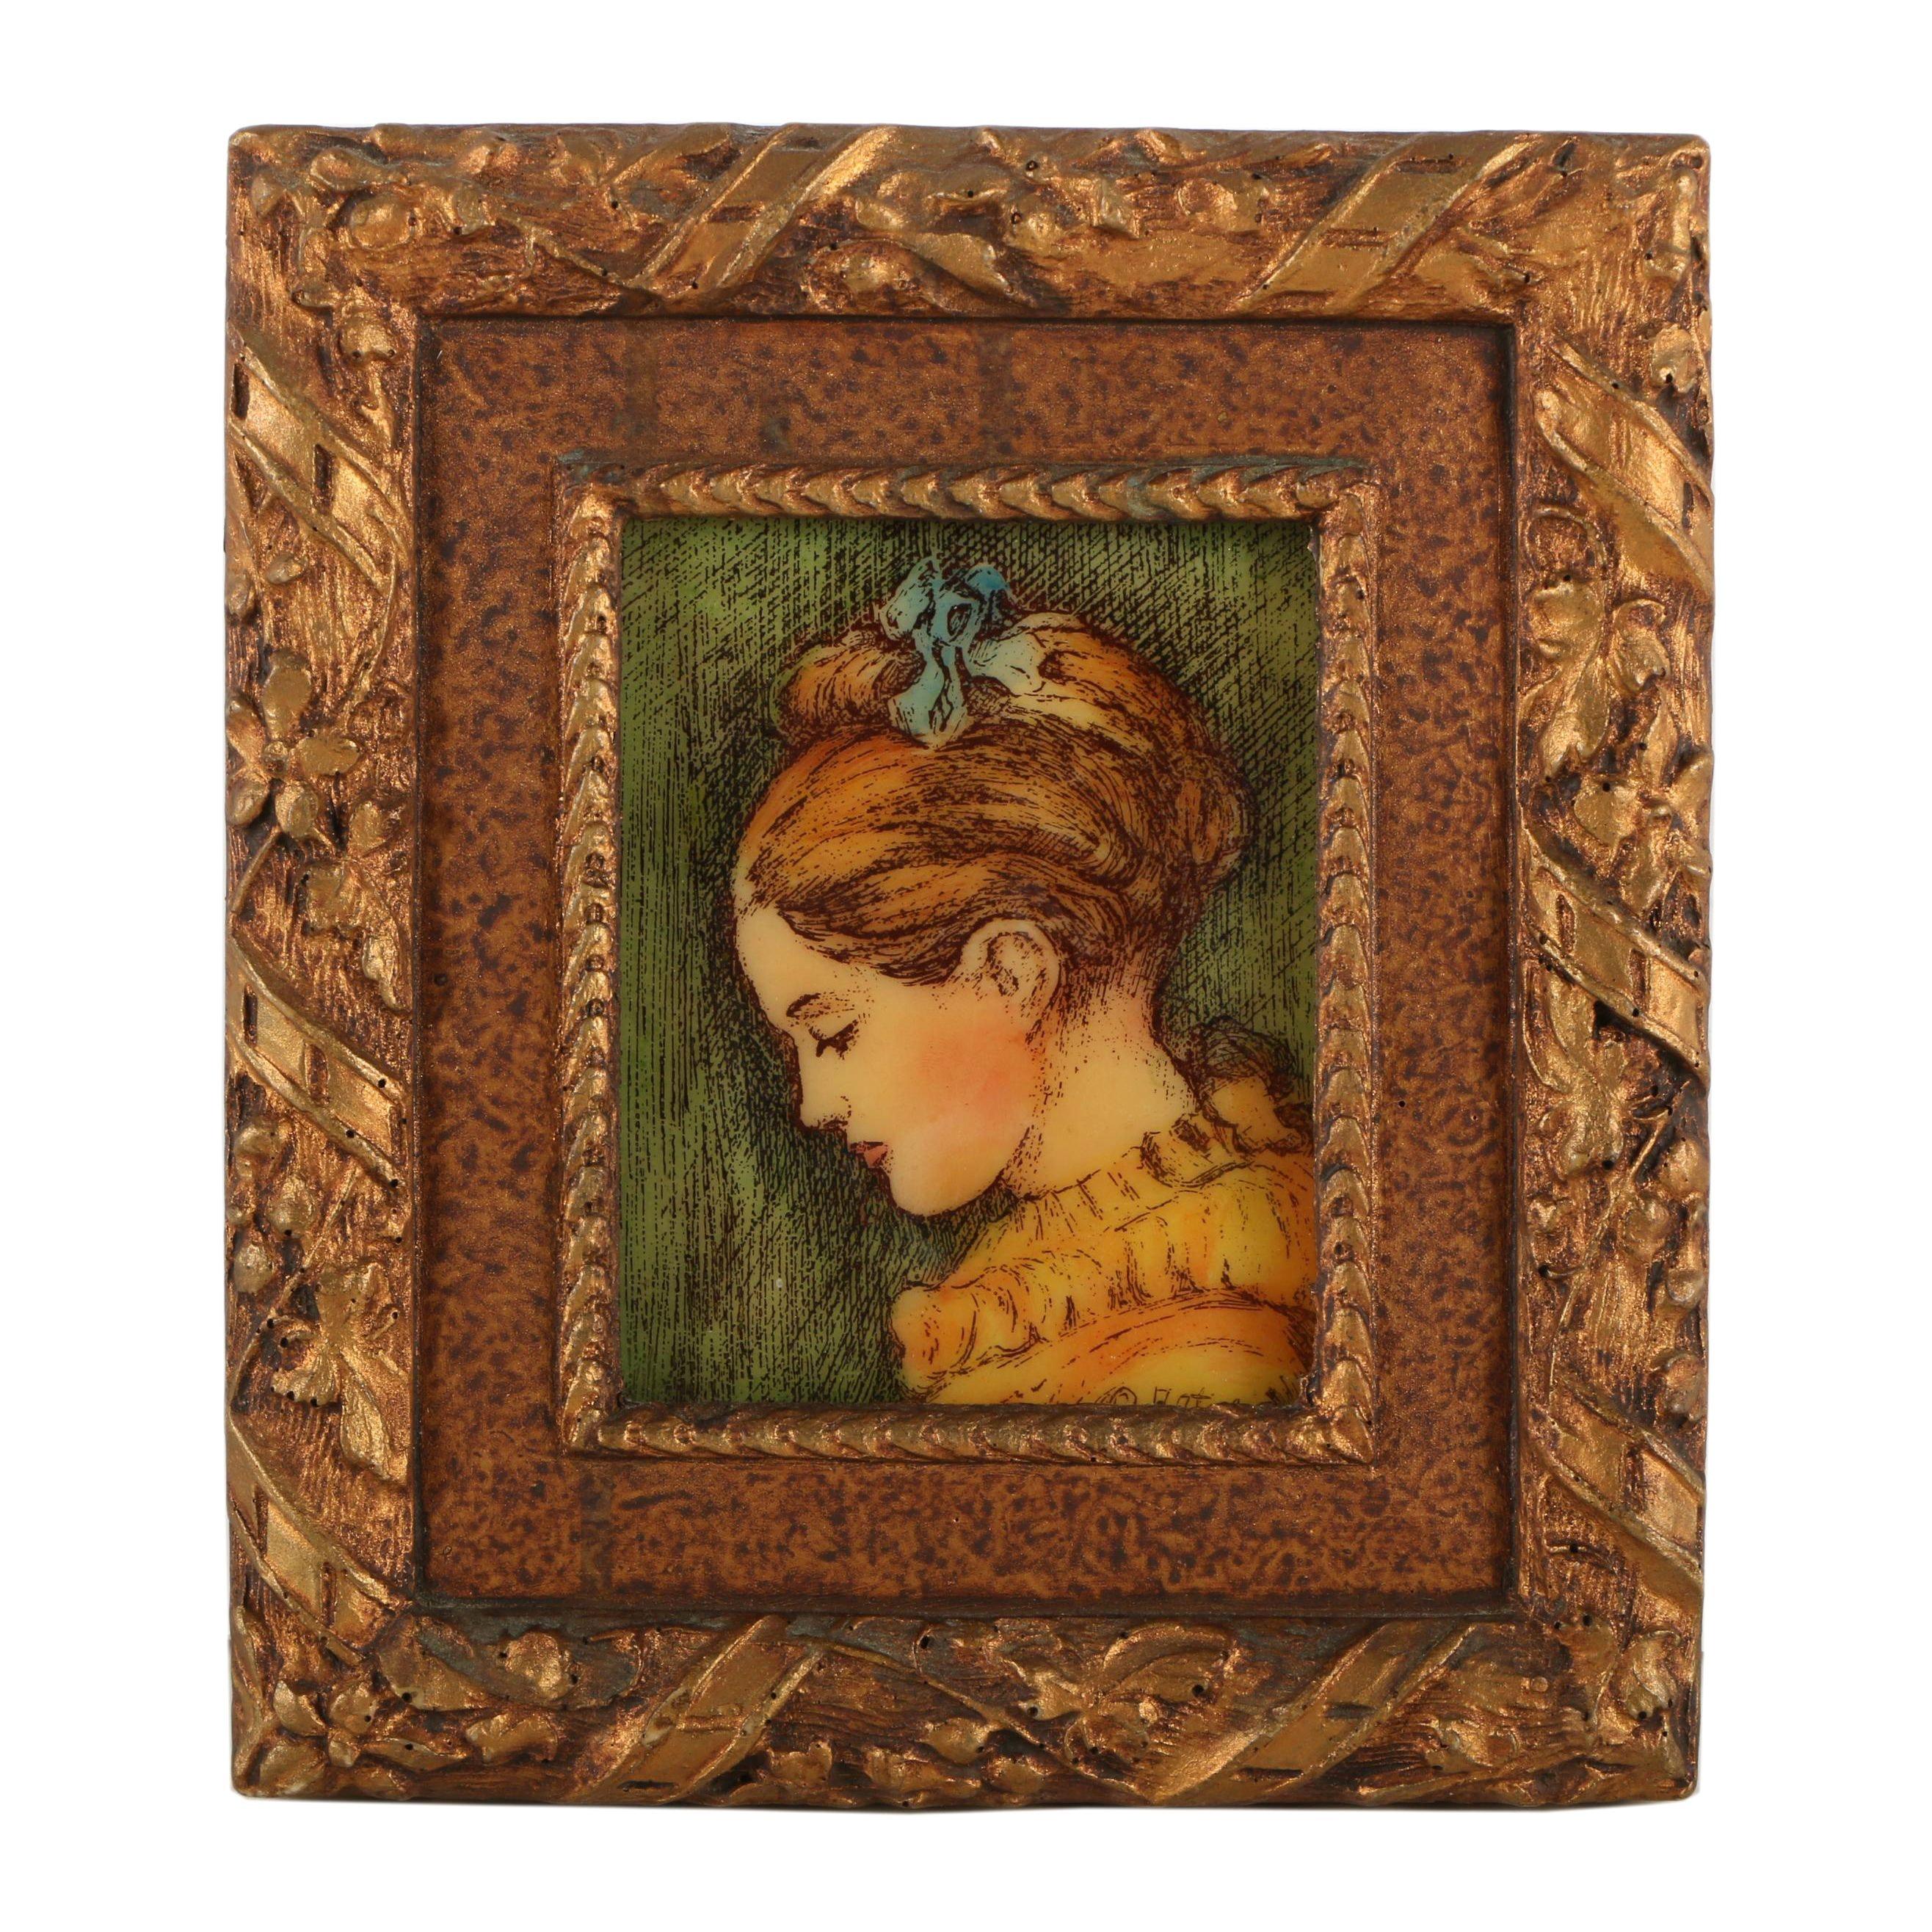 Artini Arts Hand-Painted Resin Portrait of Girl in Orange Dress